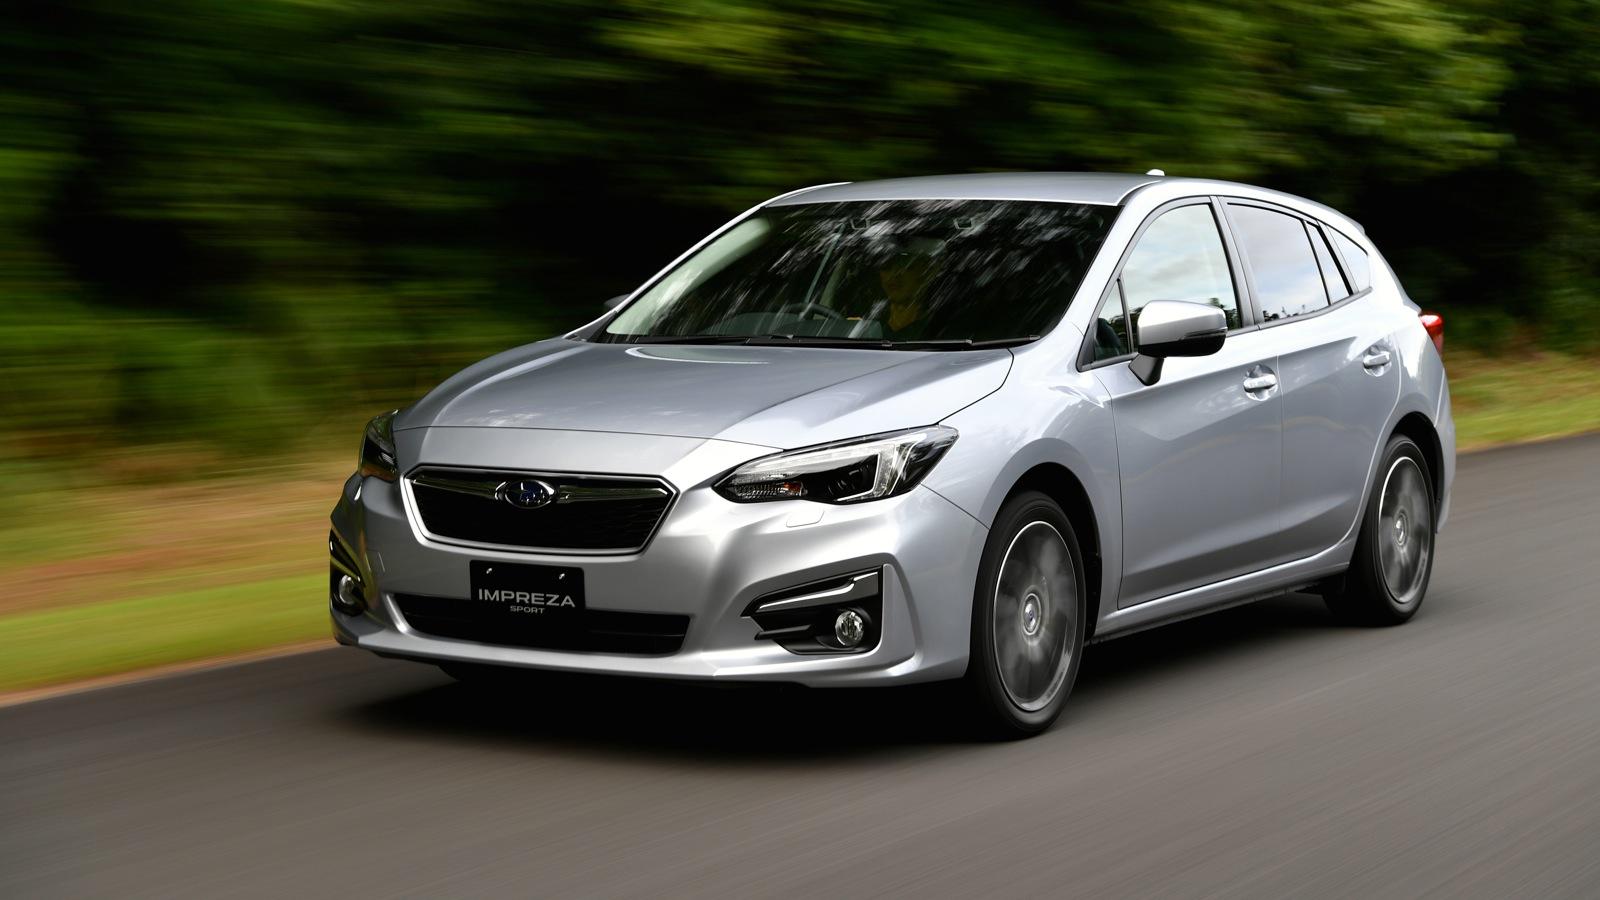 2019 Subaru Impreza >> 2017 Subaru Impreza Review - photos | CarAdvice